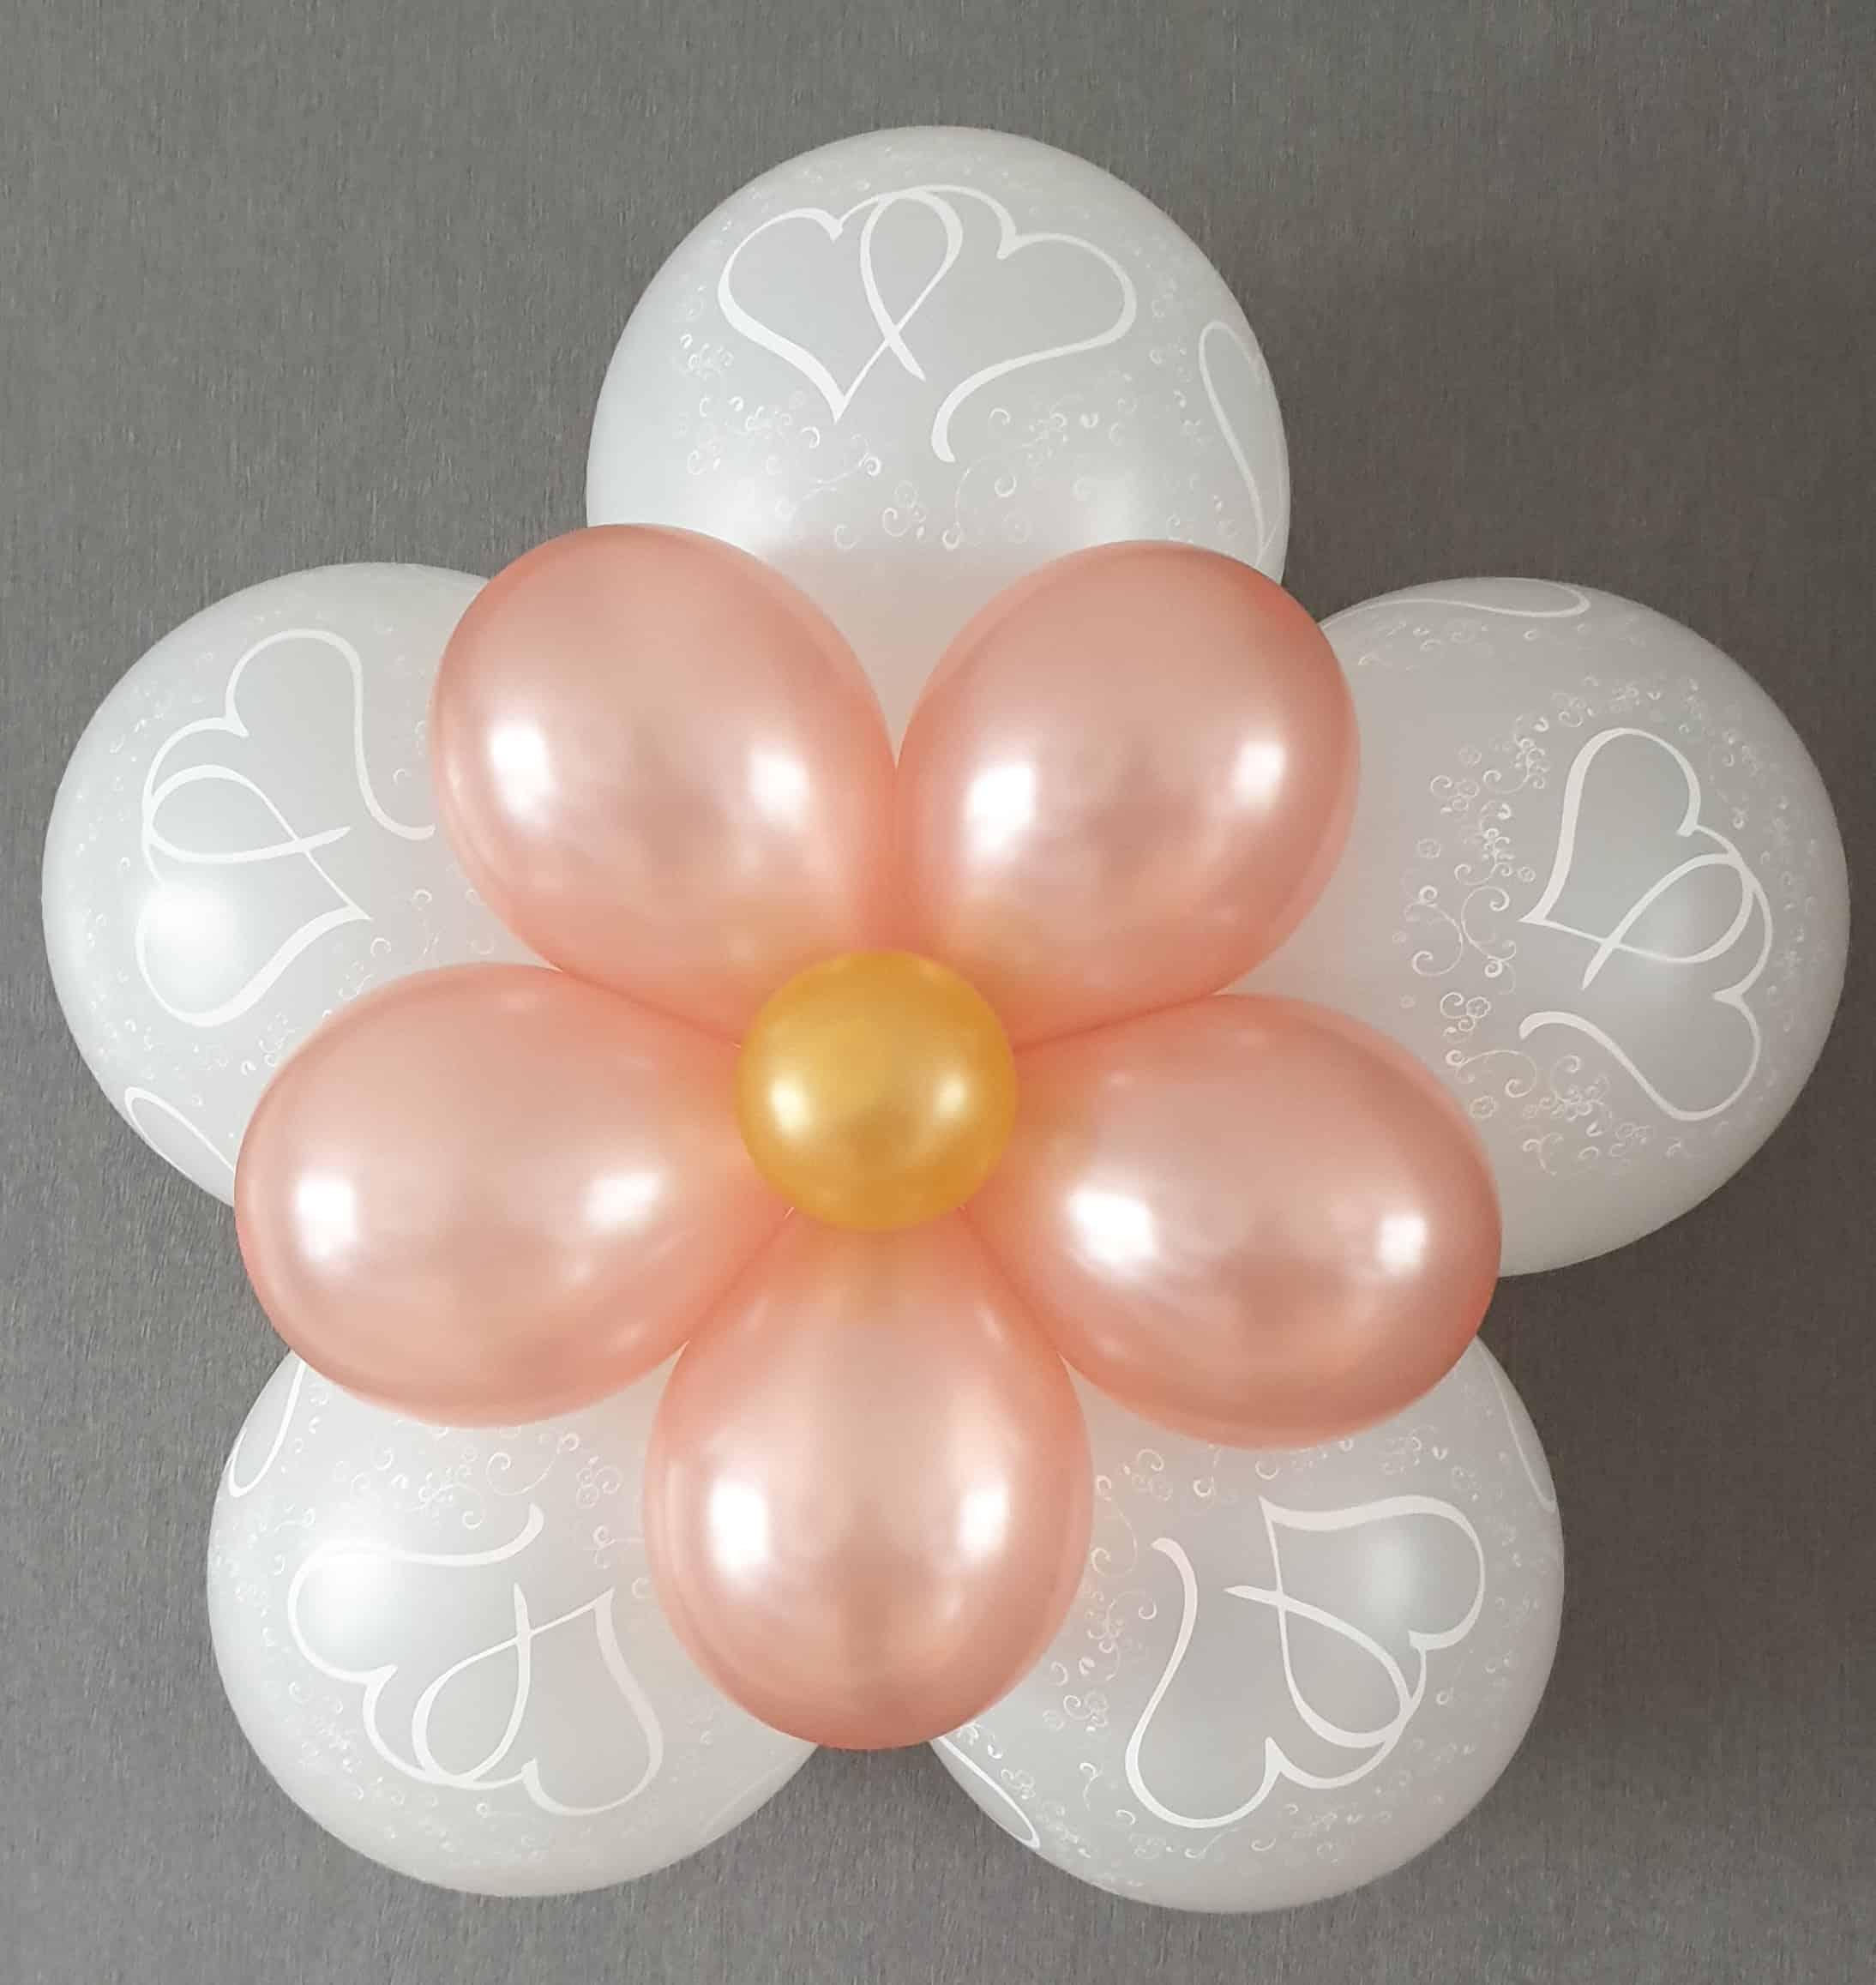 boondesigns ballondecoratie ballonbloem de luxe